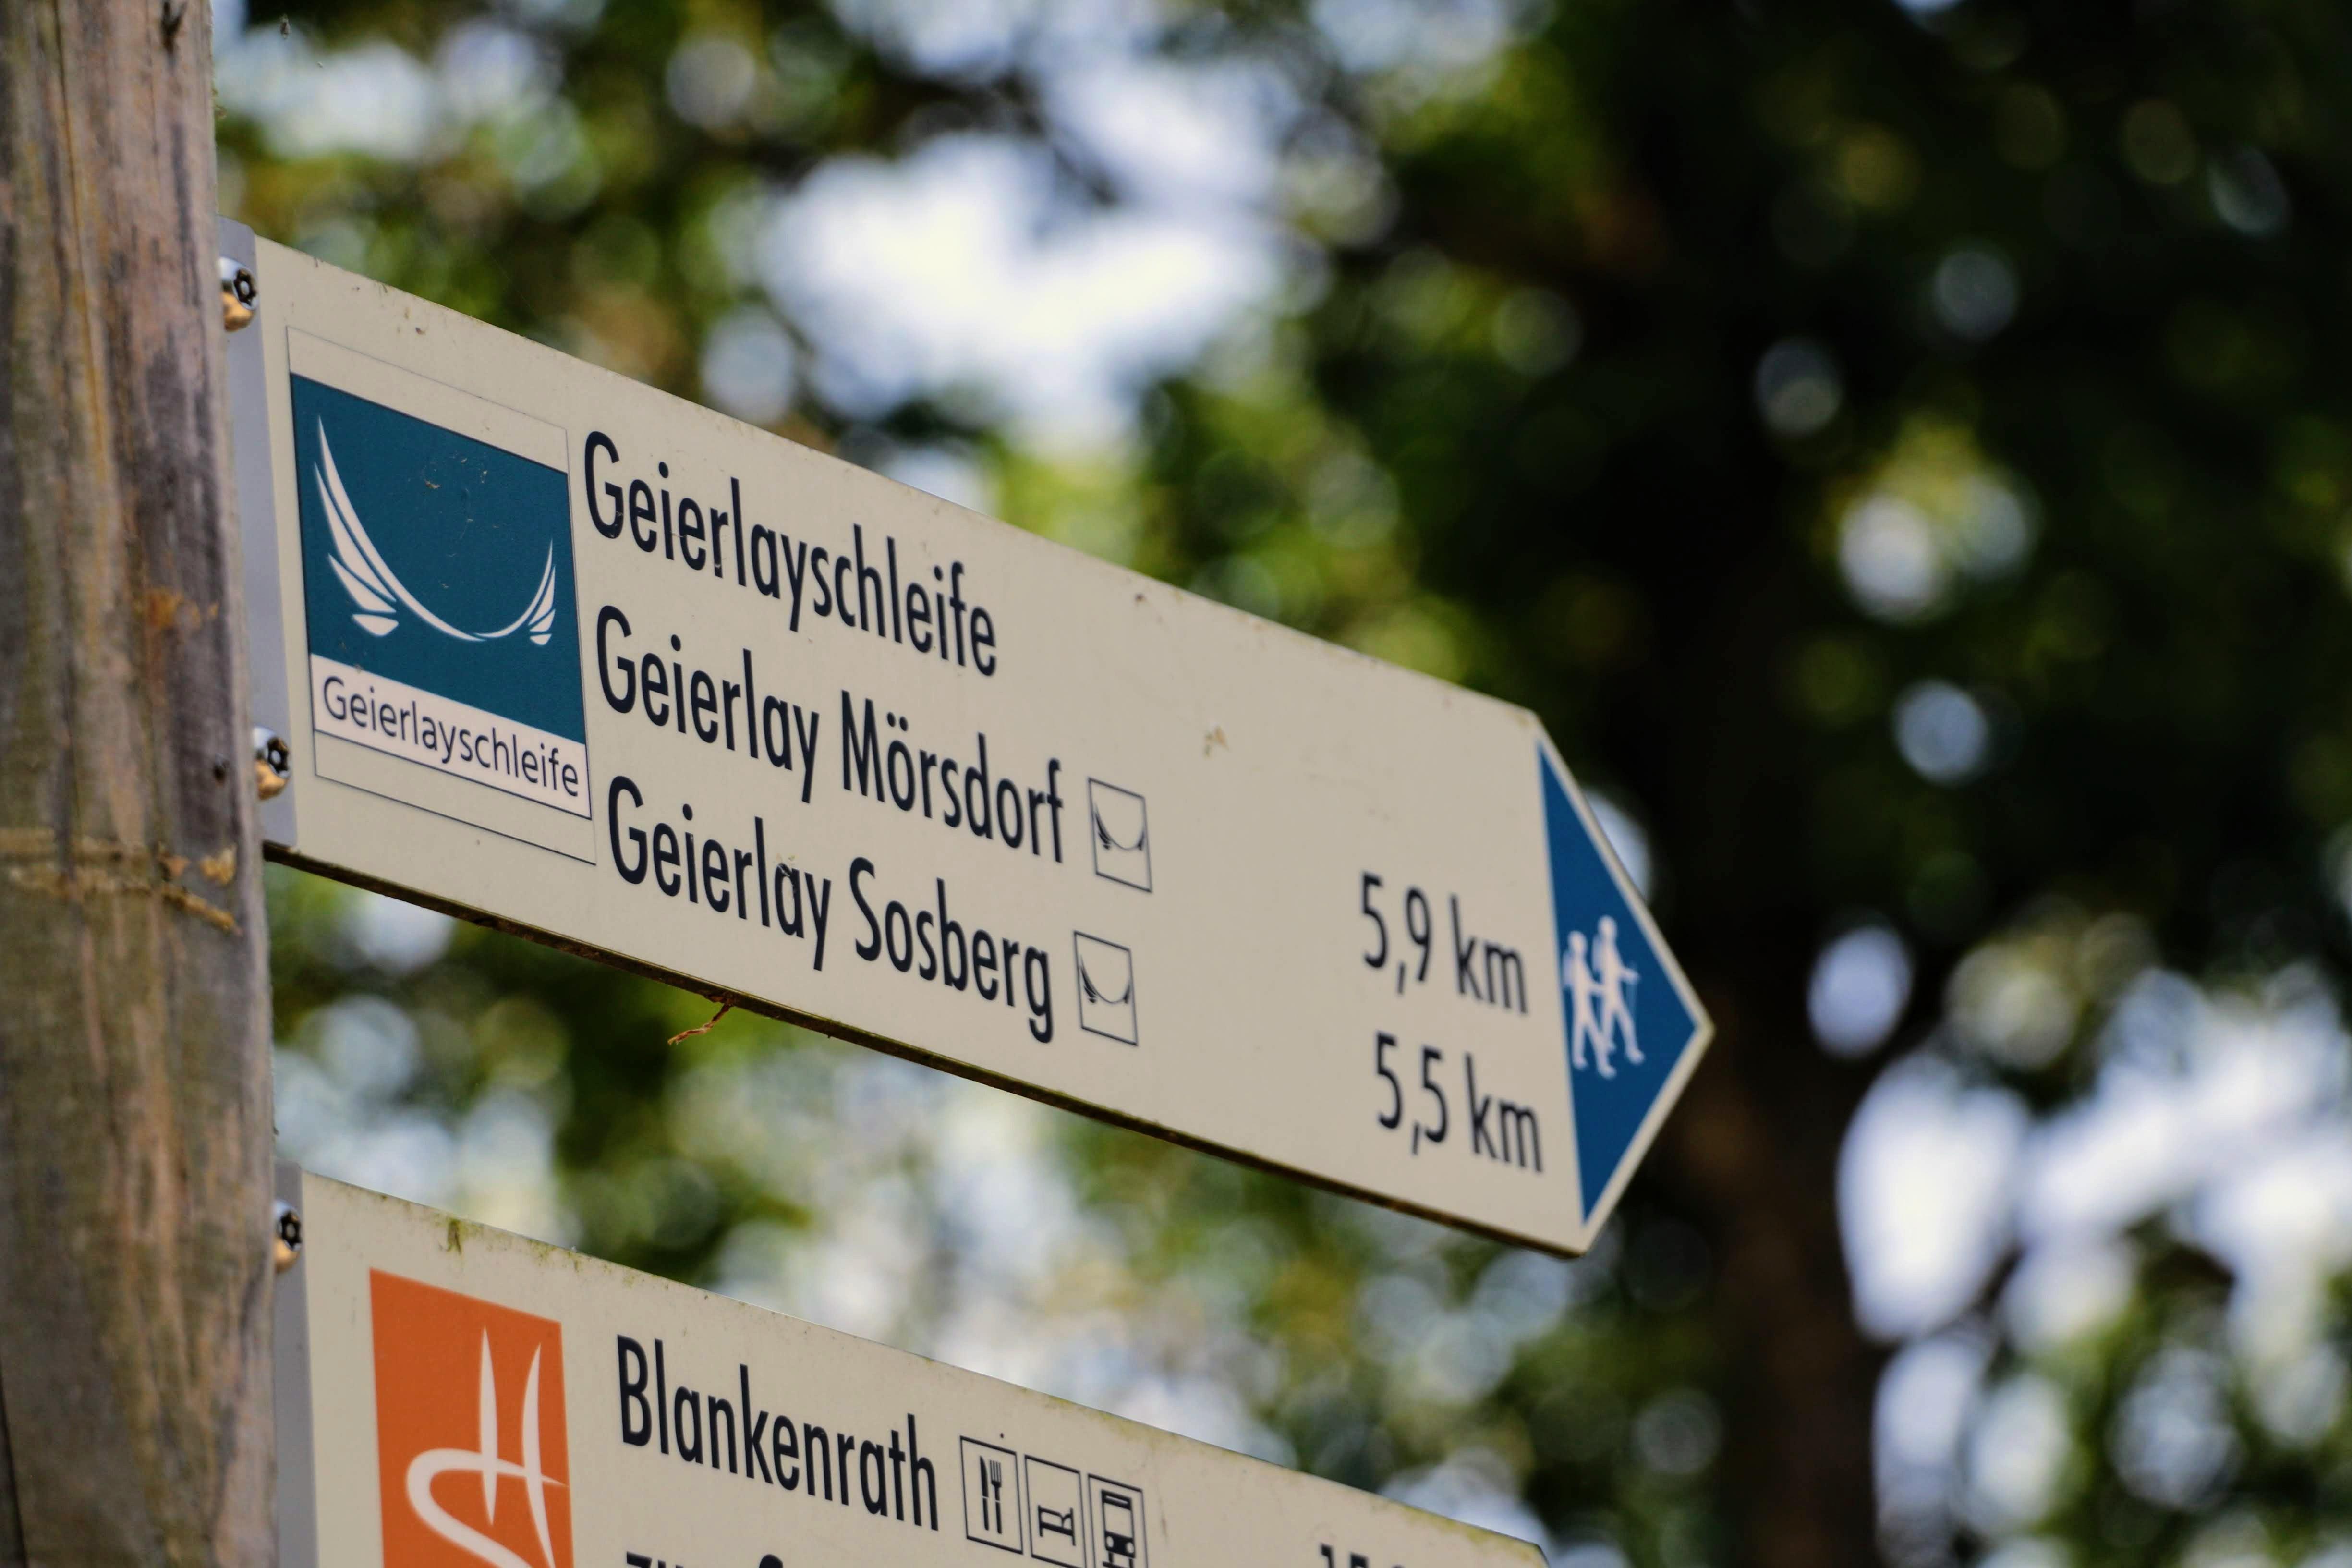 Wandeling geierlayschleife mörsdorf